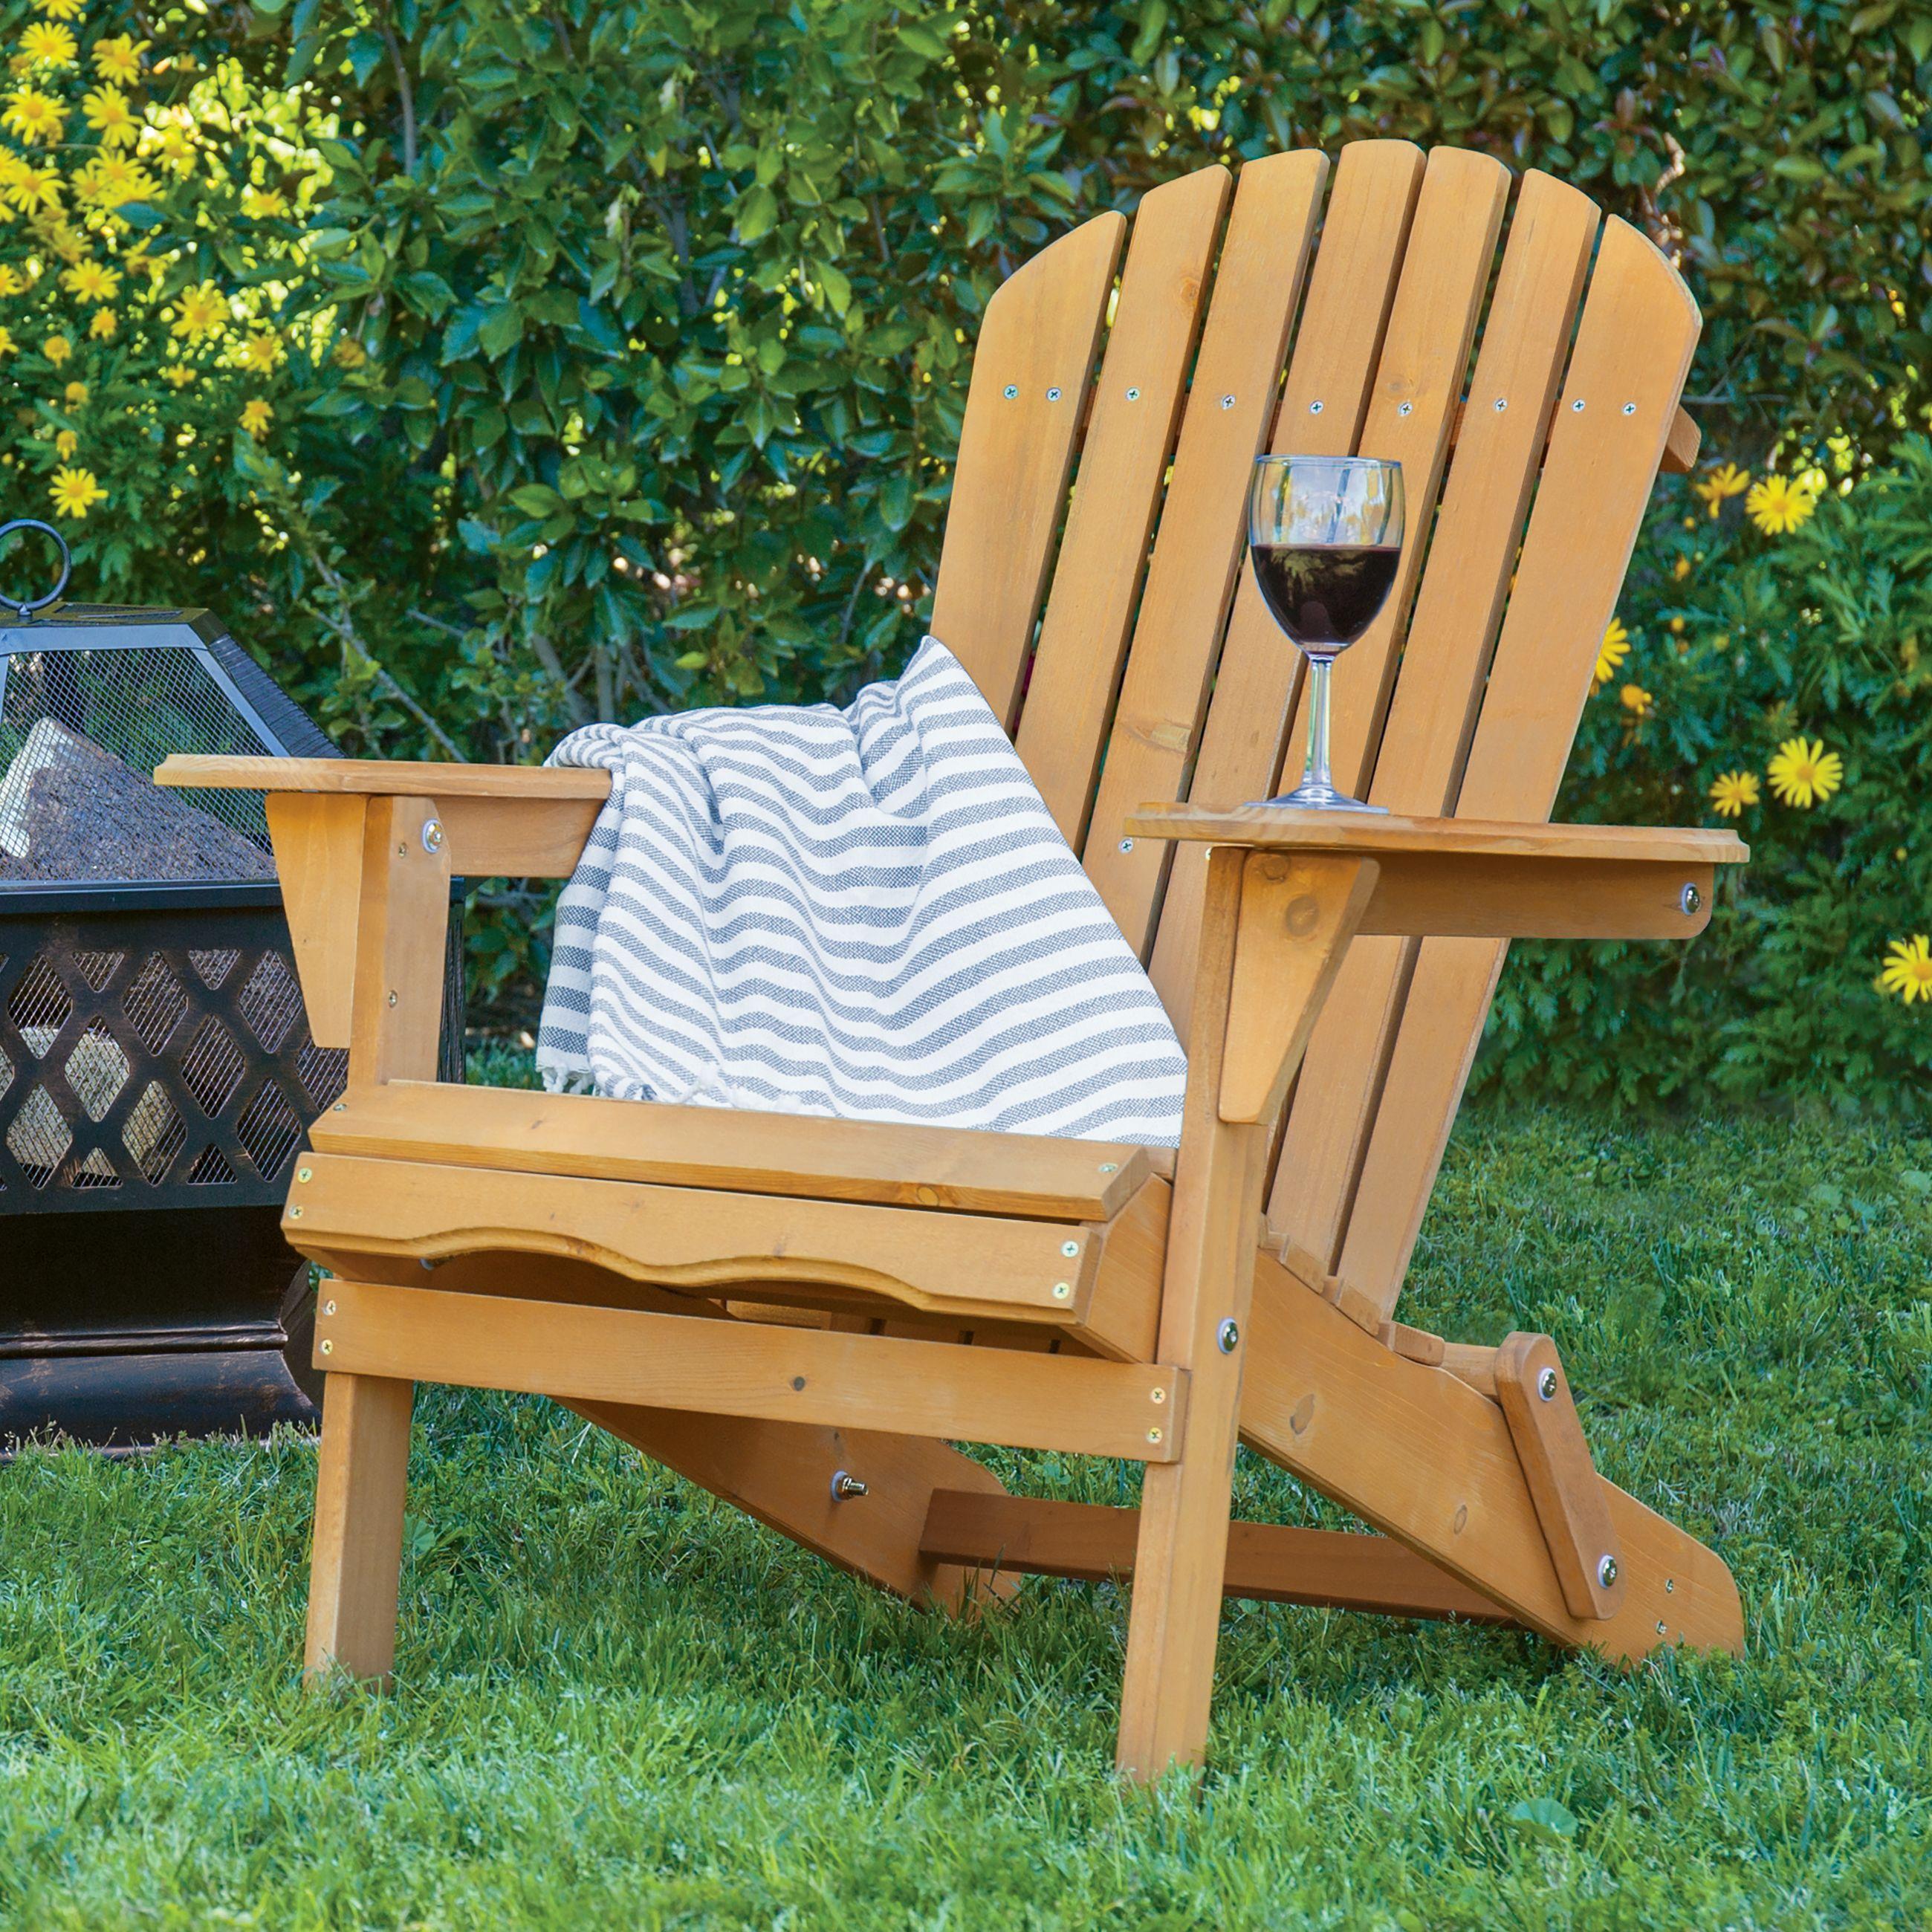 Patio Garden Wood Adirondack Chairs Wood Patio Garden Furniture